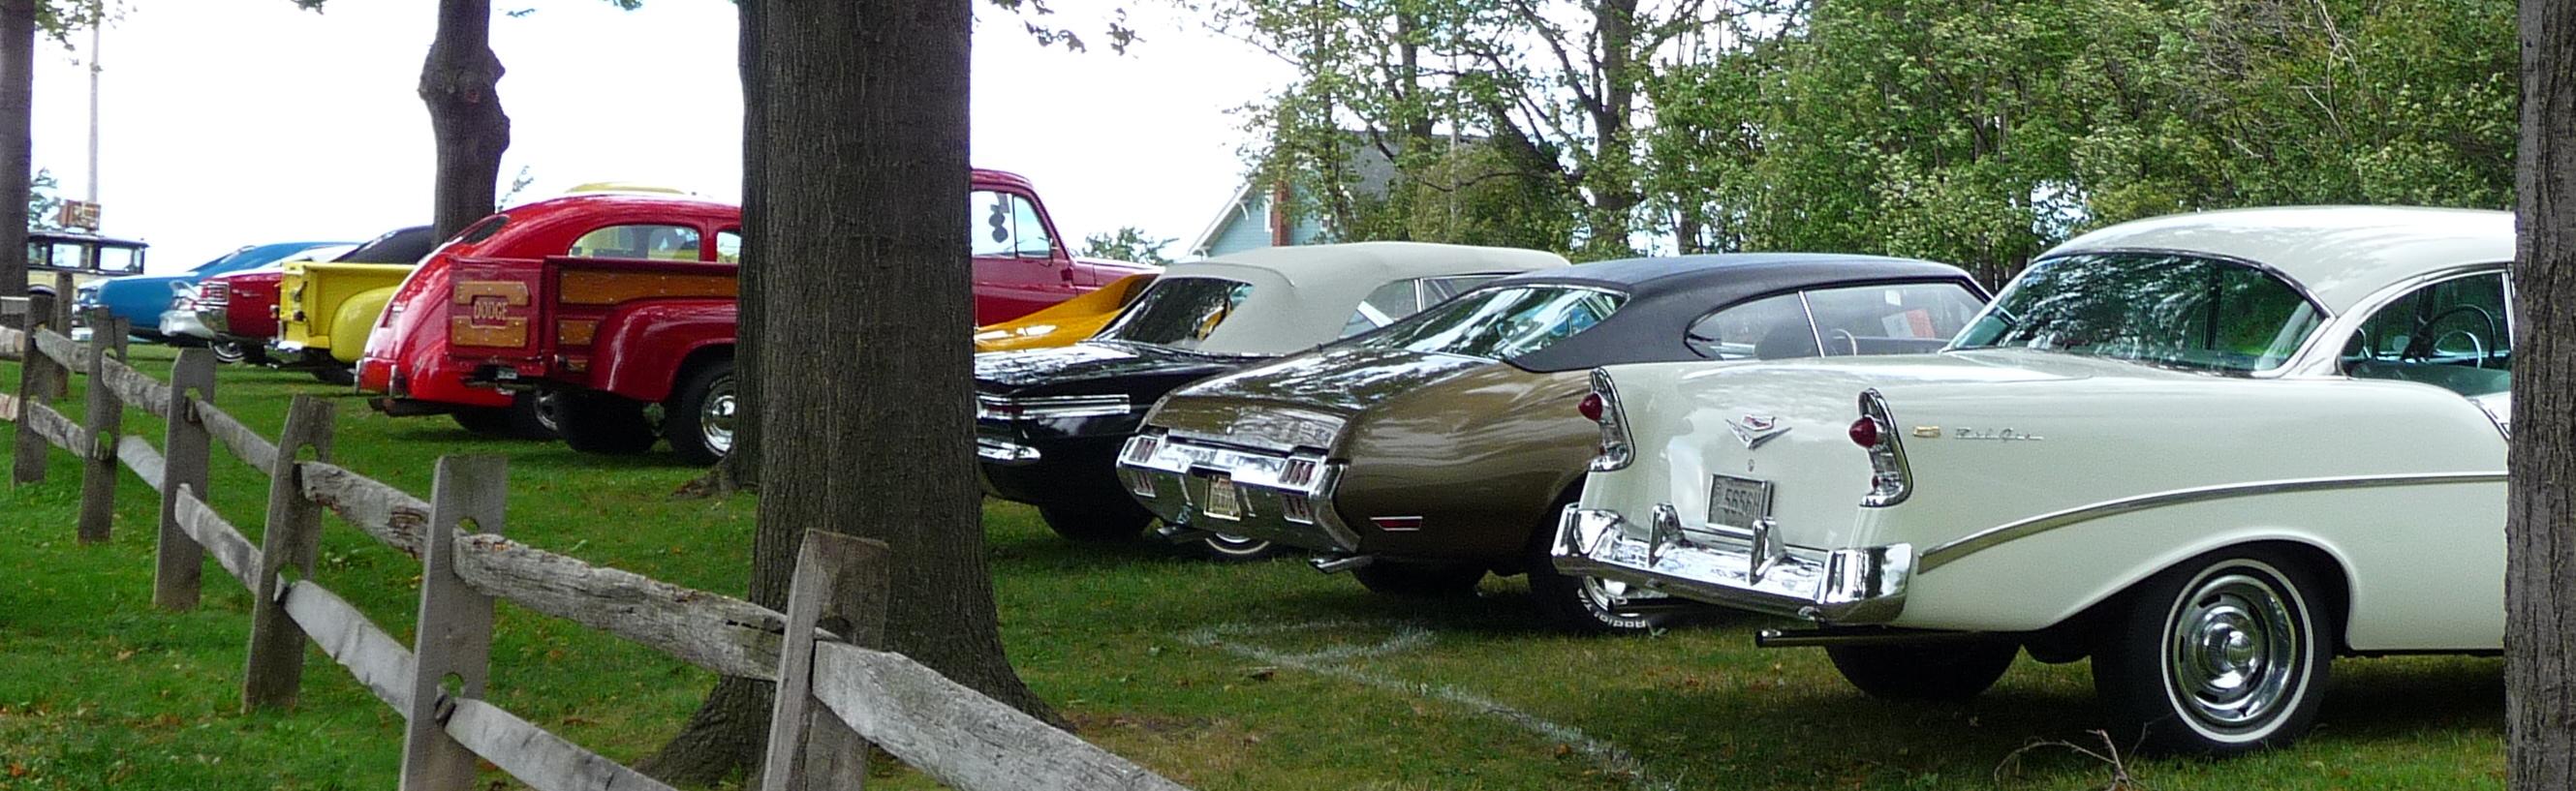 Pretty Old Cars | North Coast Muse